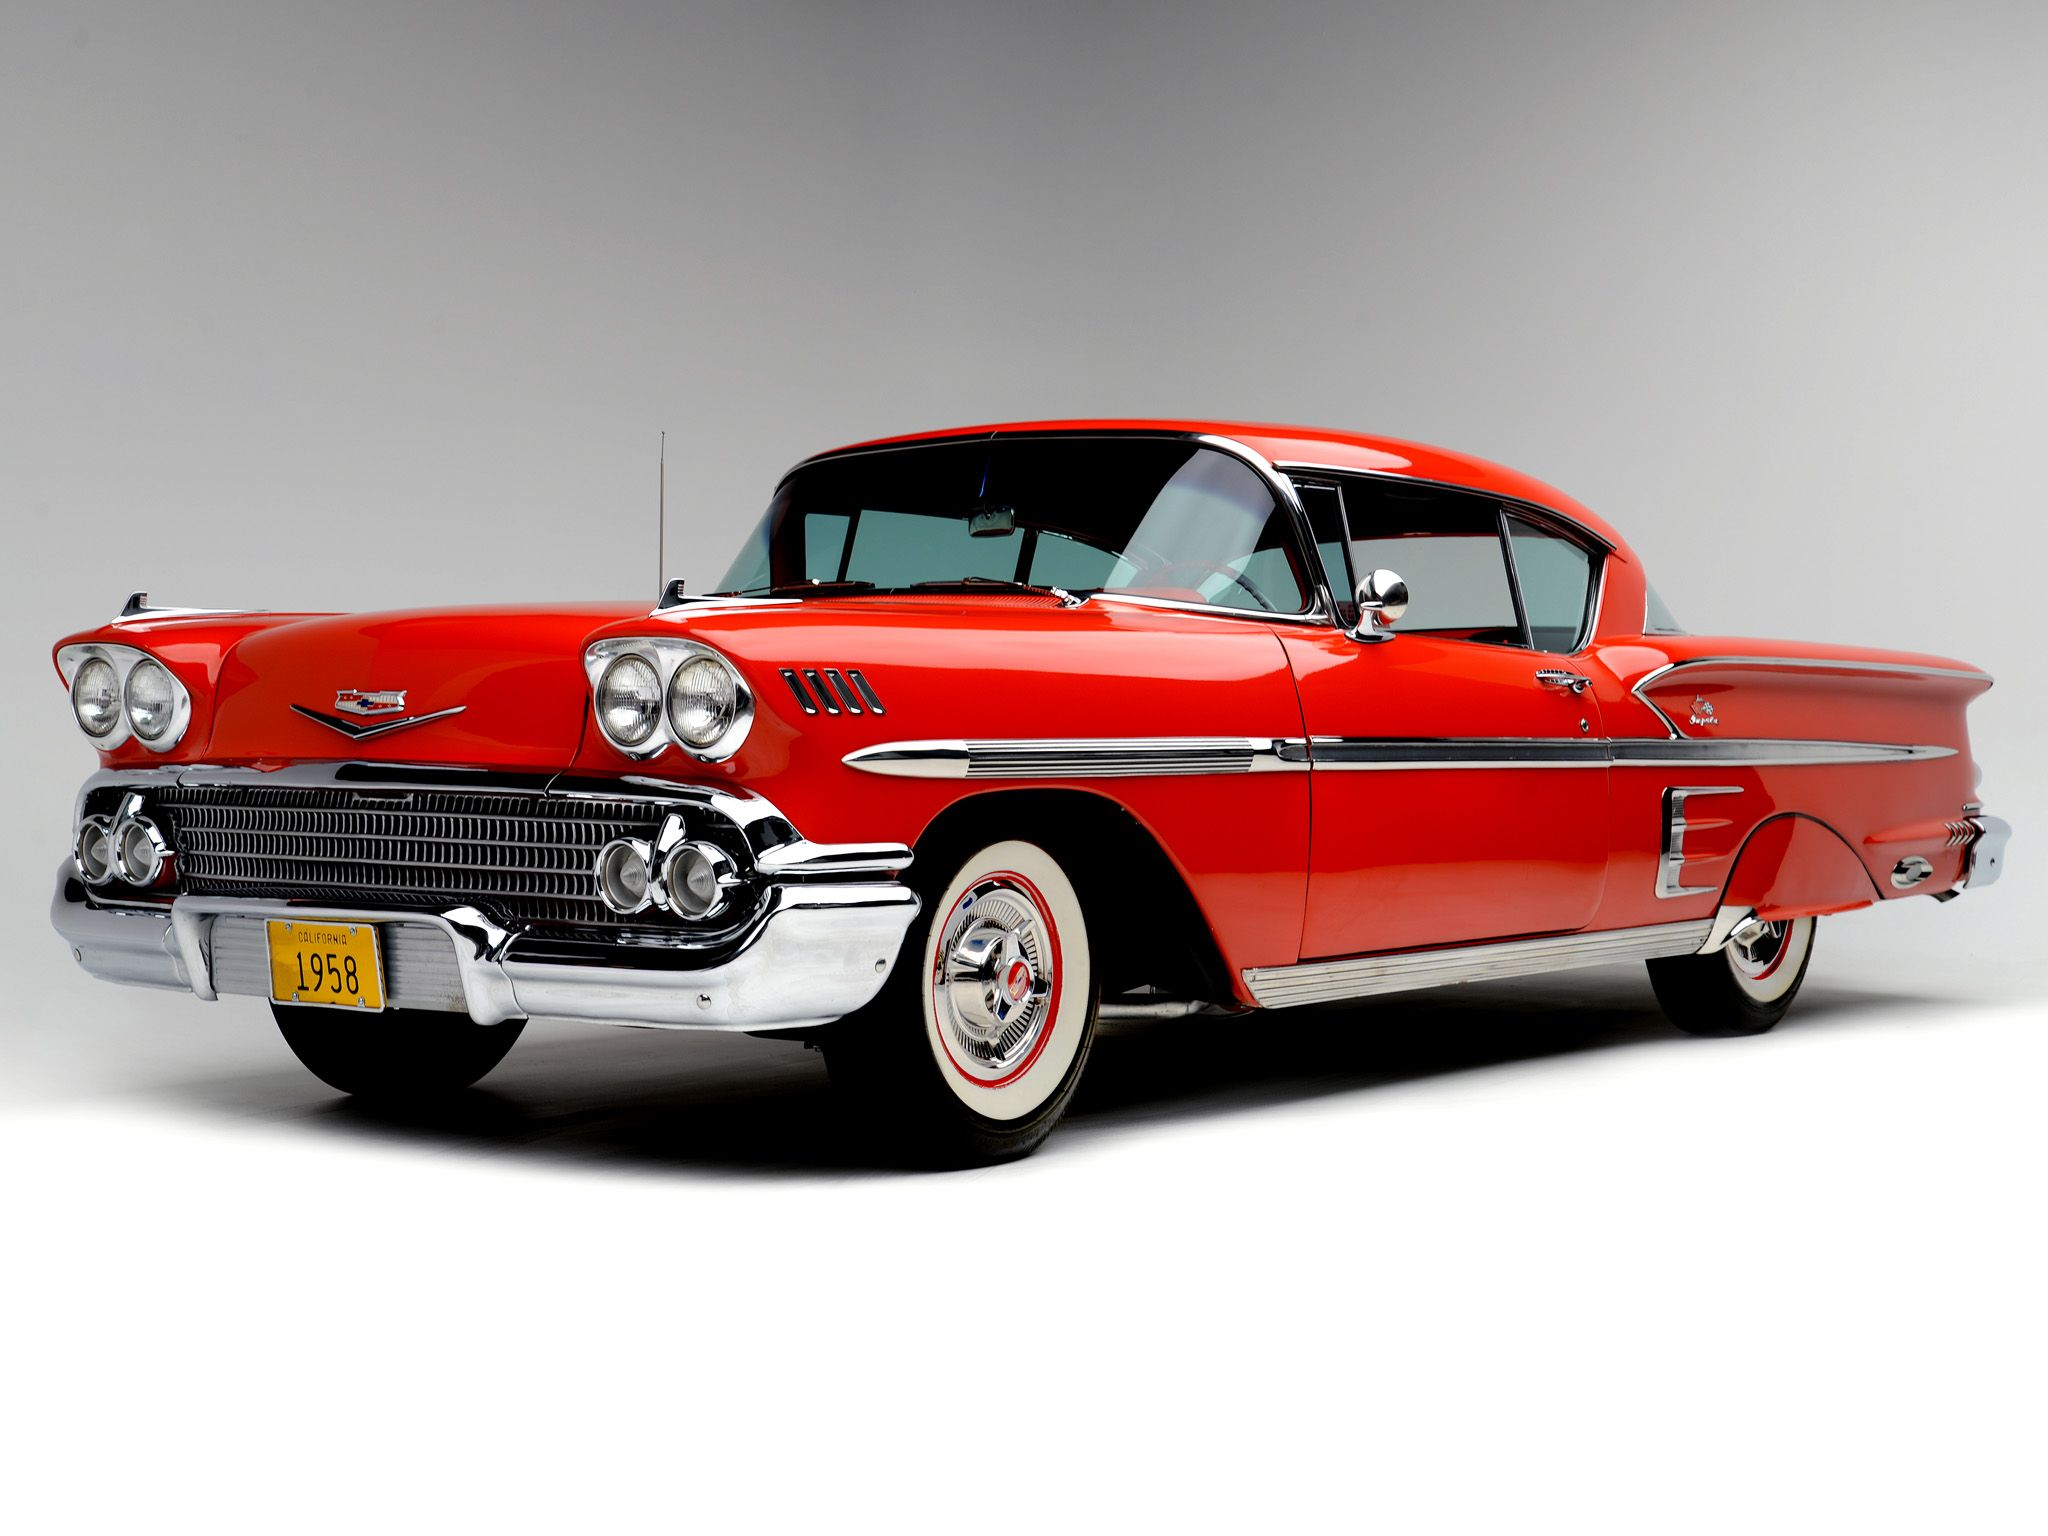 1958 Chevrolet Bel Air Impala E58 American Classic Cars Chevrolet Impala Classic Cars